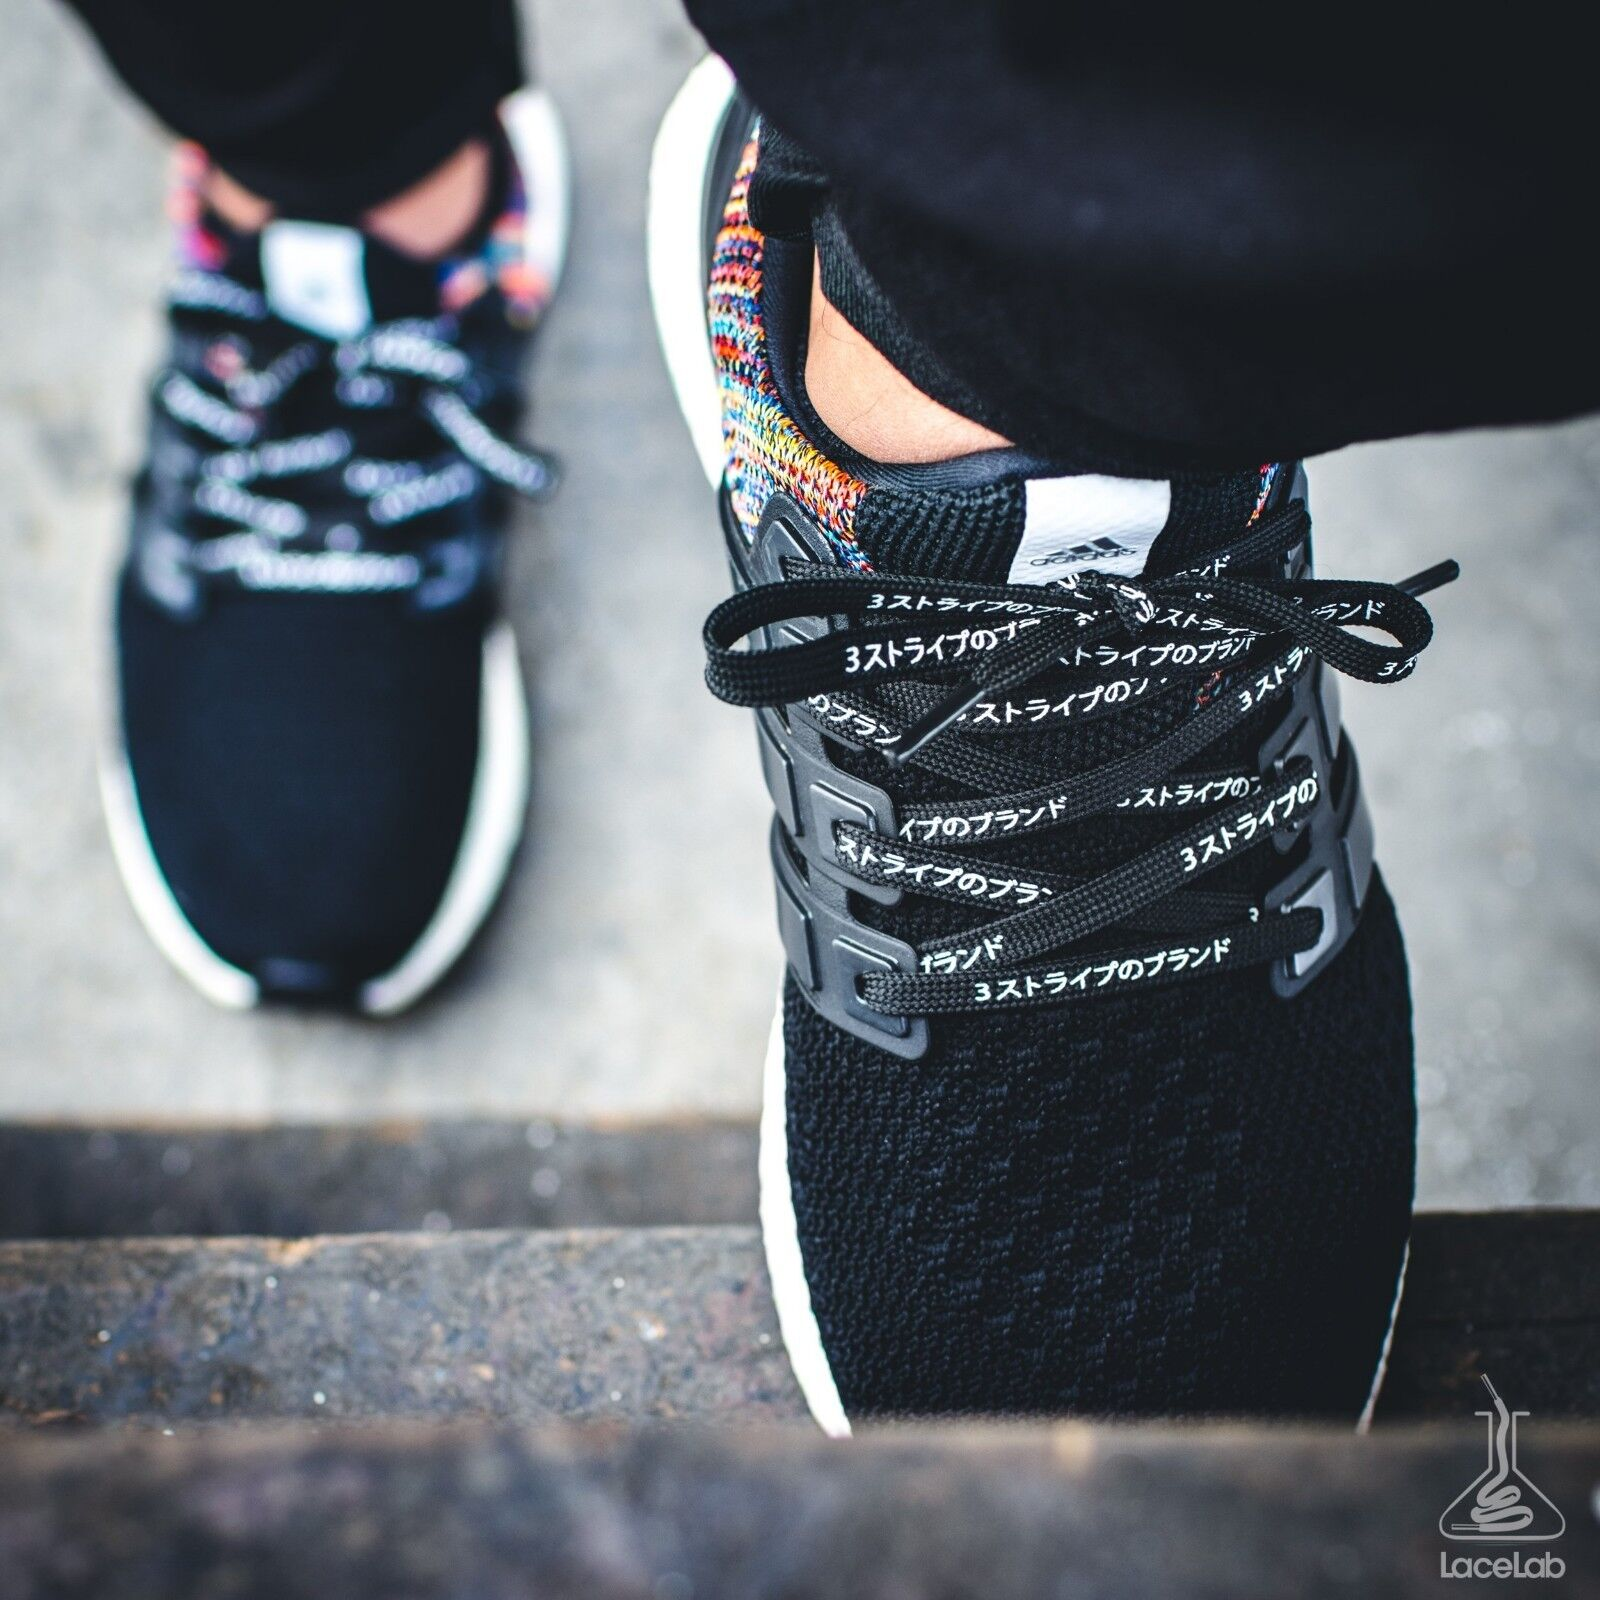 "NMD Shoelaces Ultra Boost Laces ""3 Stripes"" Katakana Flat Black 30″ LACE ENVY Clothing & Shoe Care"